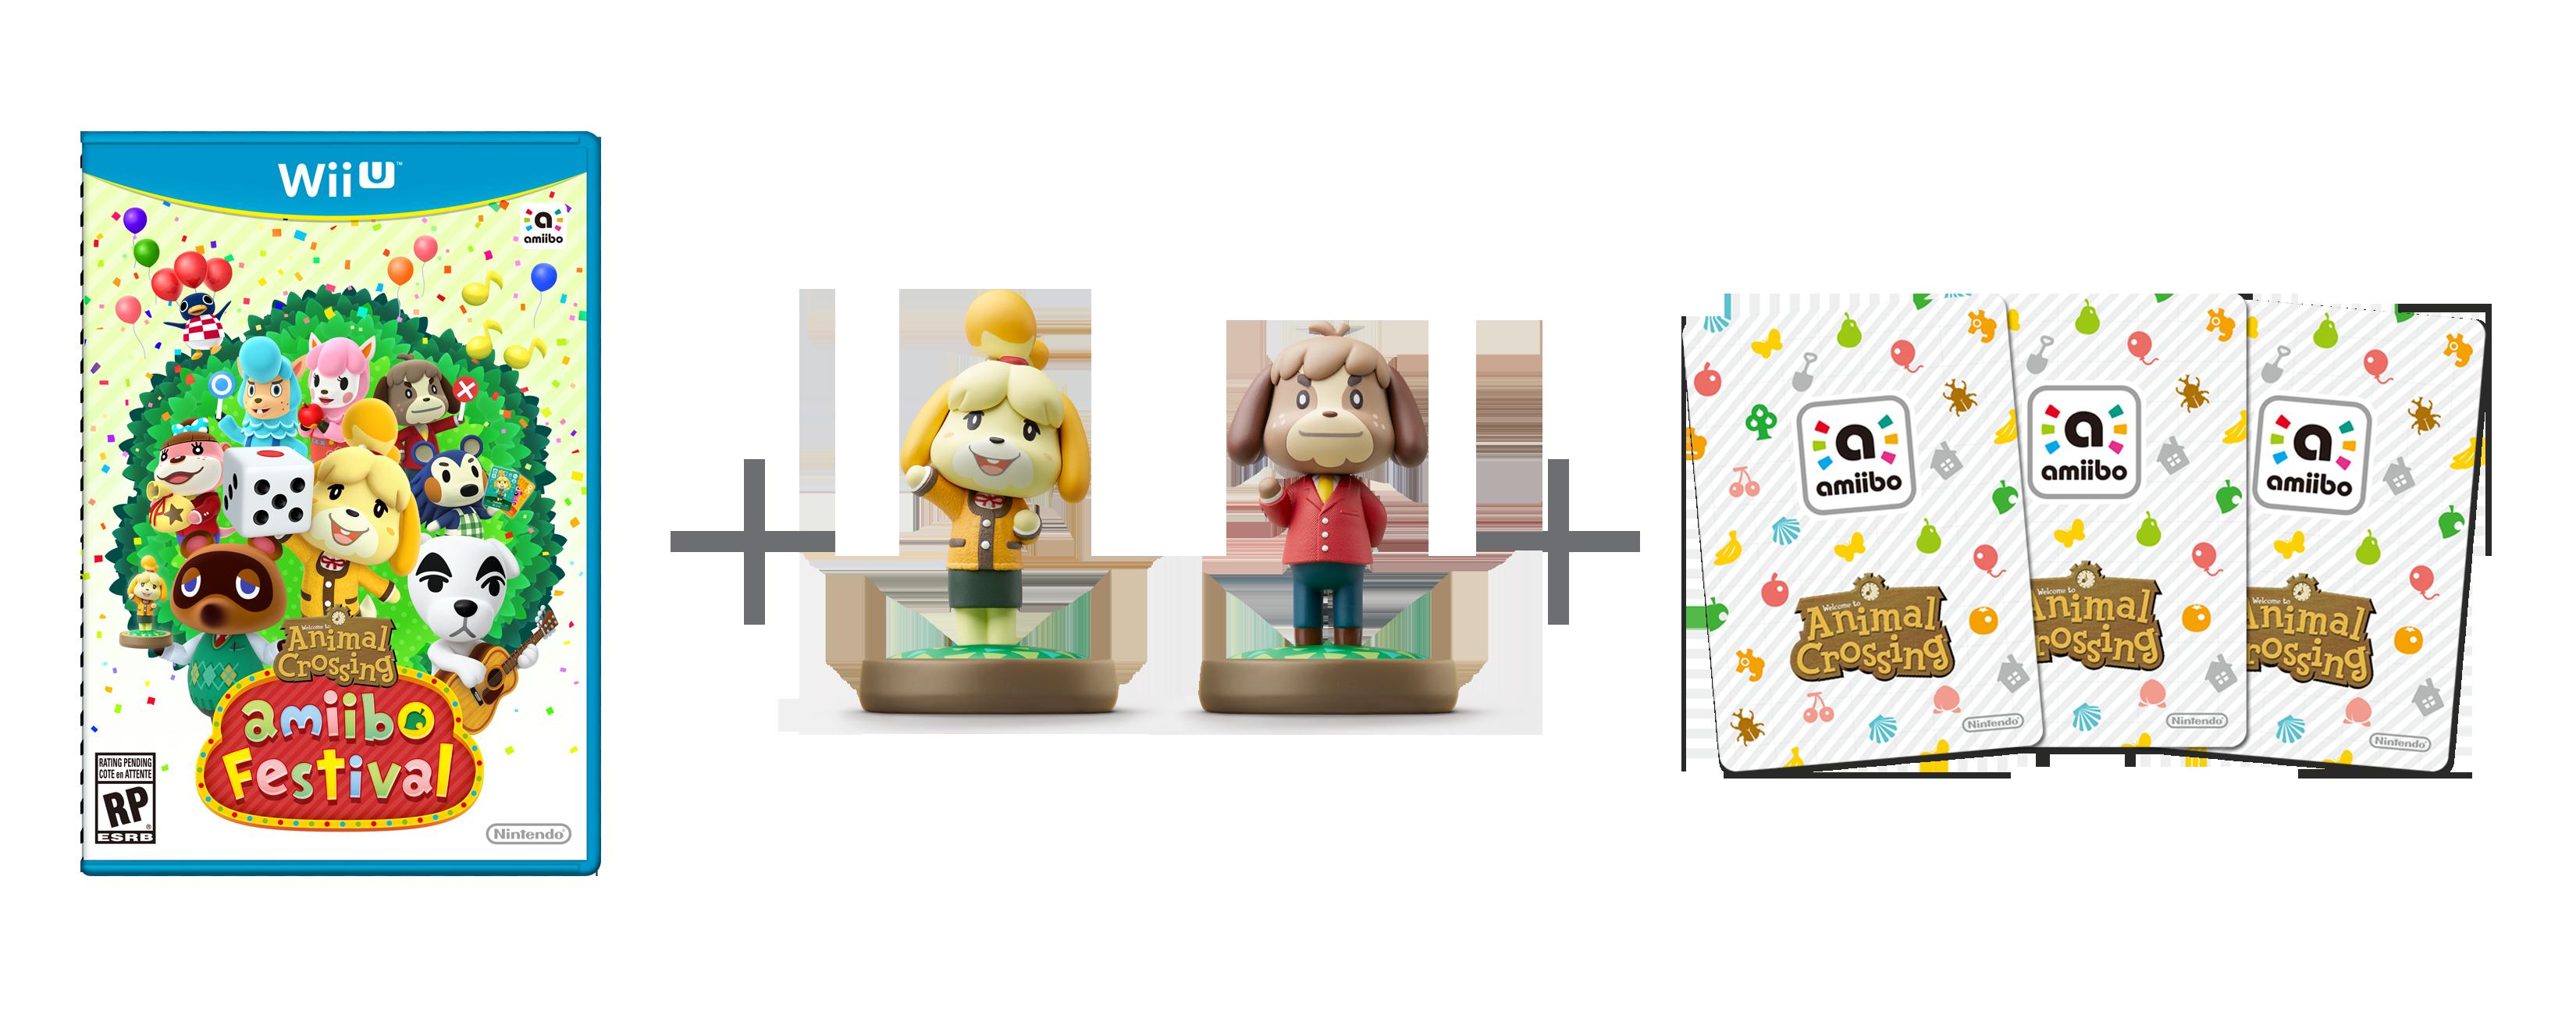 Animal Crossing Series Amiibo Figures ListCommunityVote!Subscribe